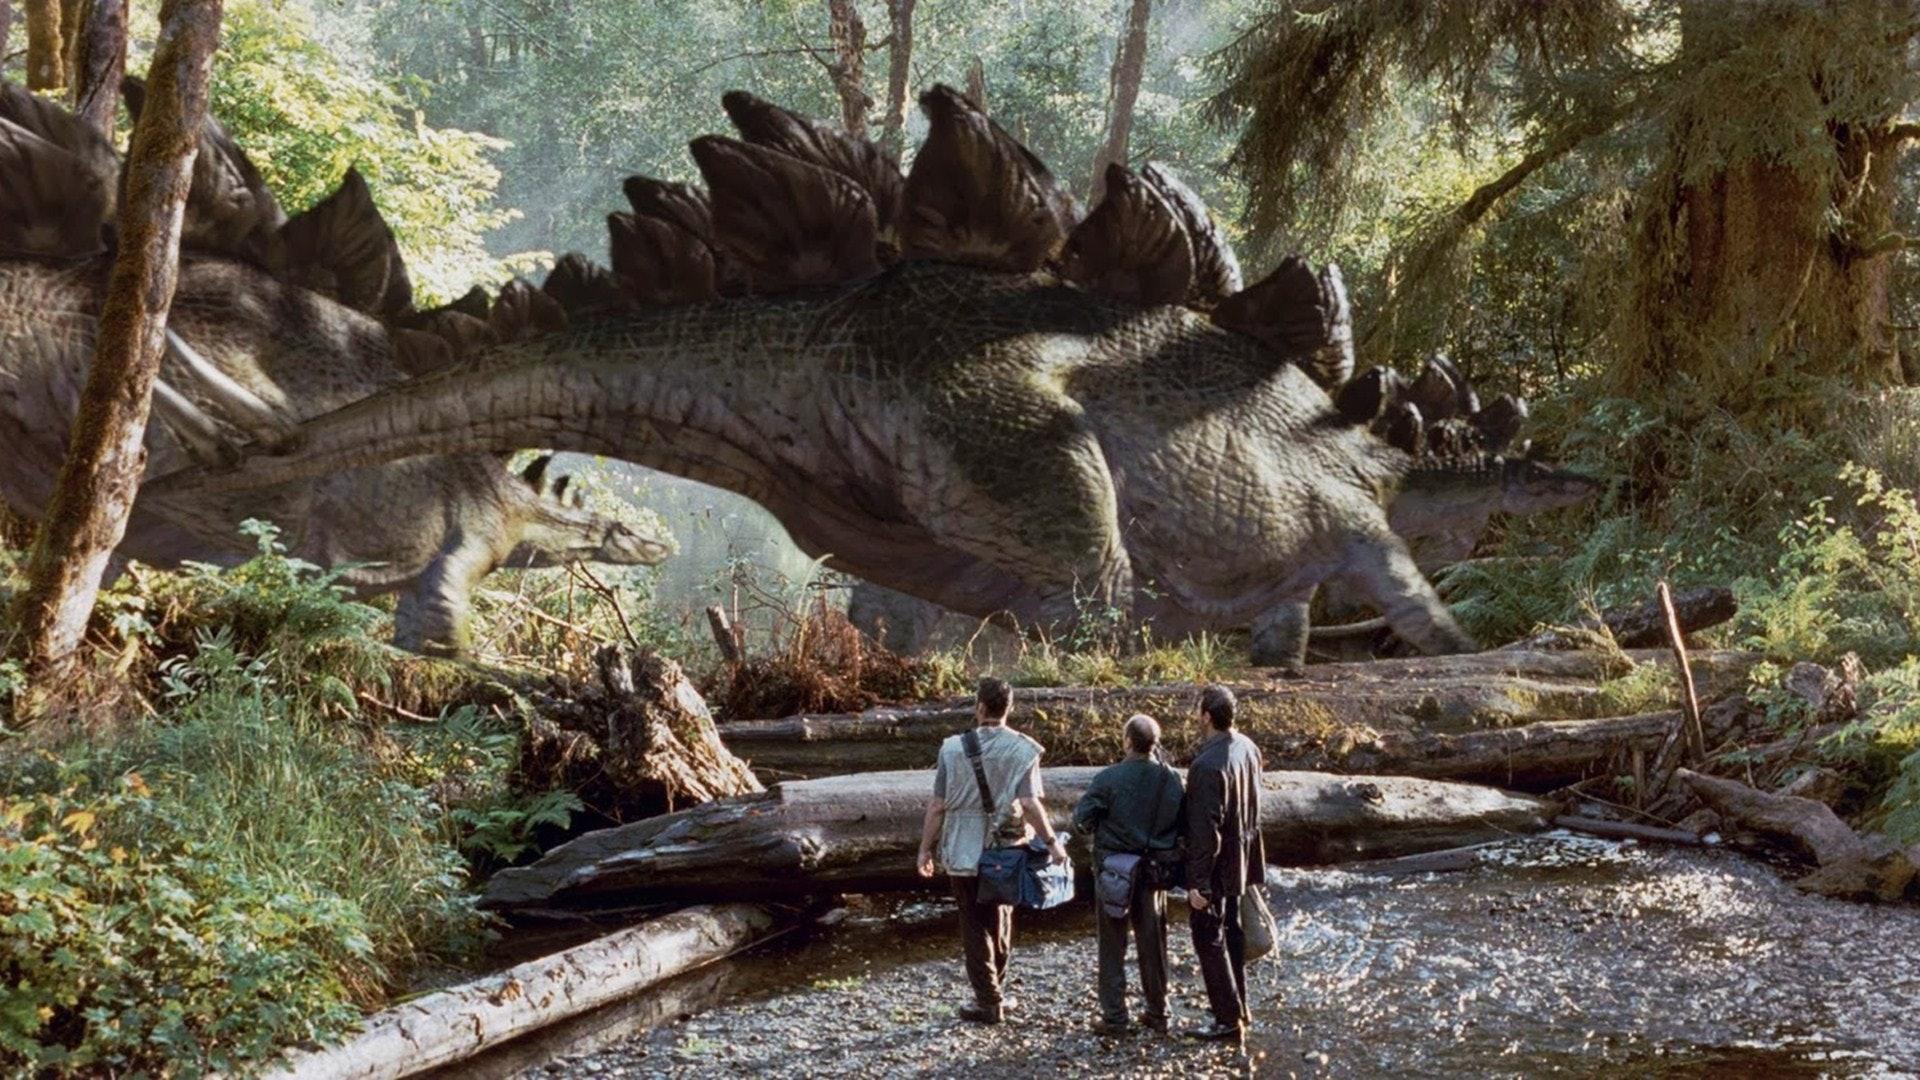 Jurassic world wallpaper wallpapersafari.